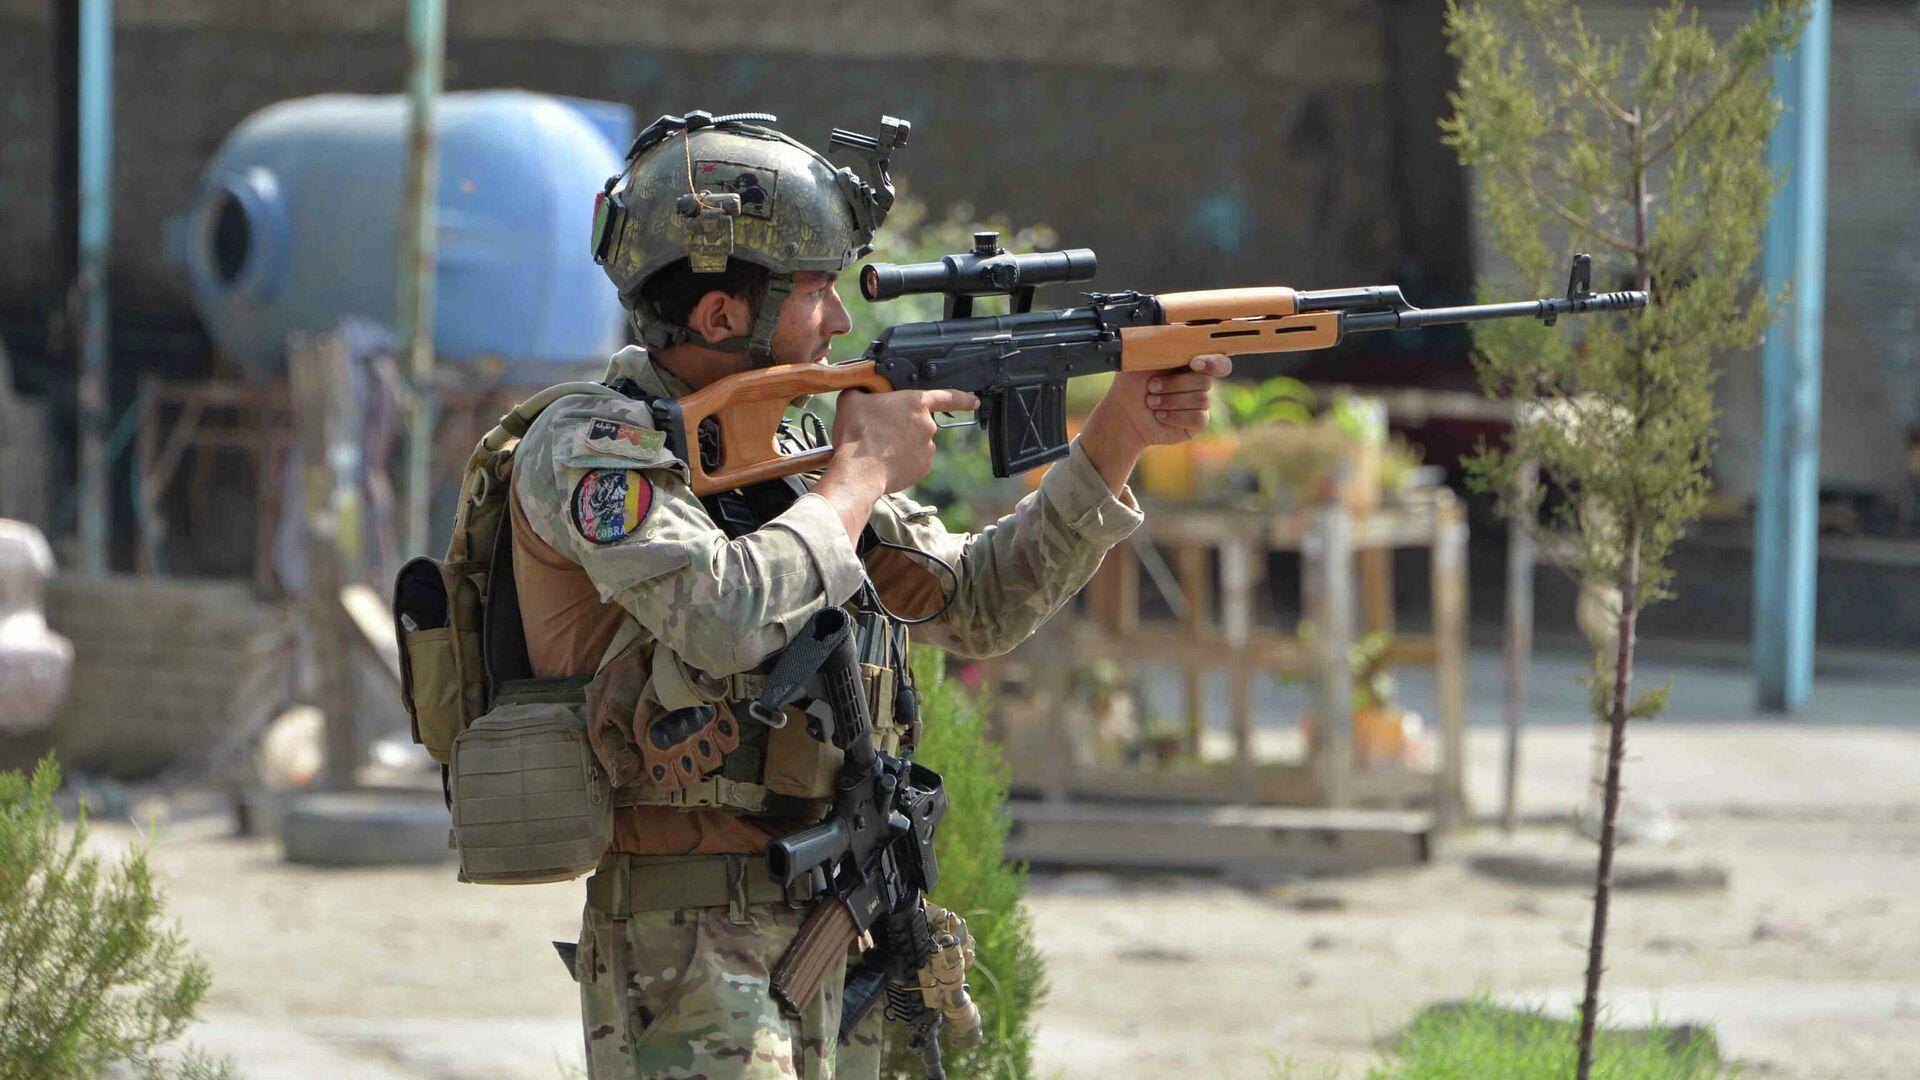 Soldado afgano en Jalalabad, Afganistán - Sputnik Mundo, 1920, 26.02.2021